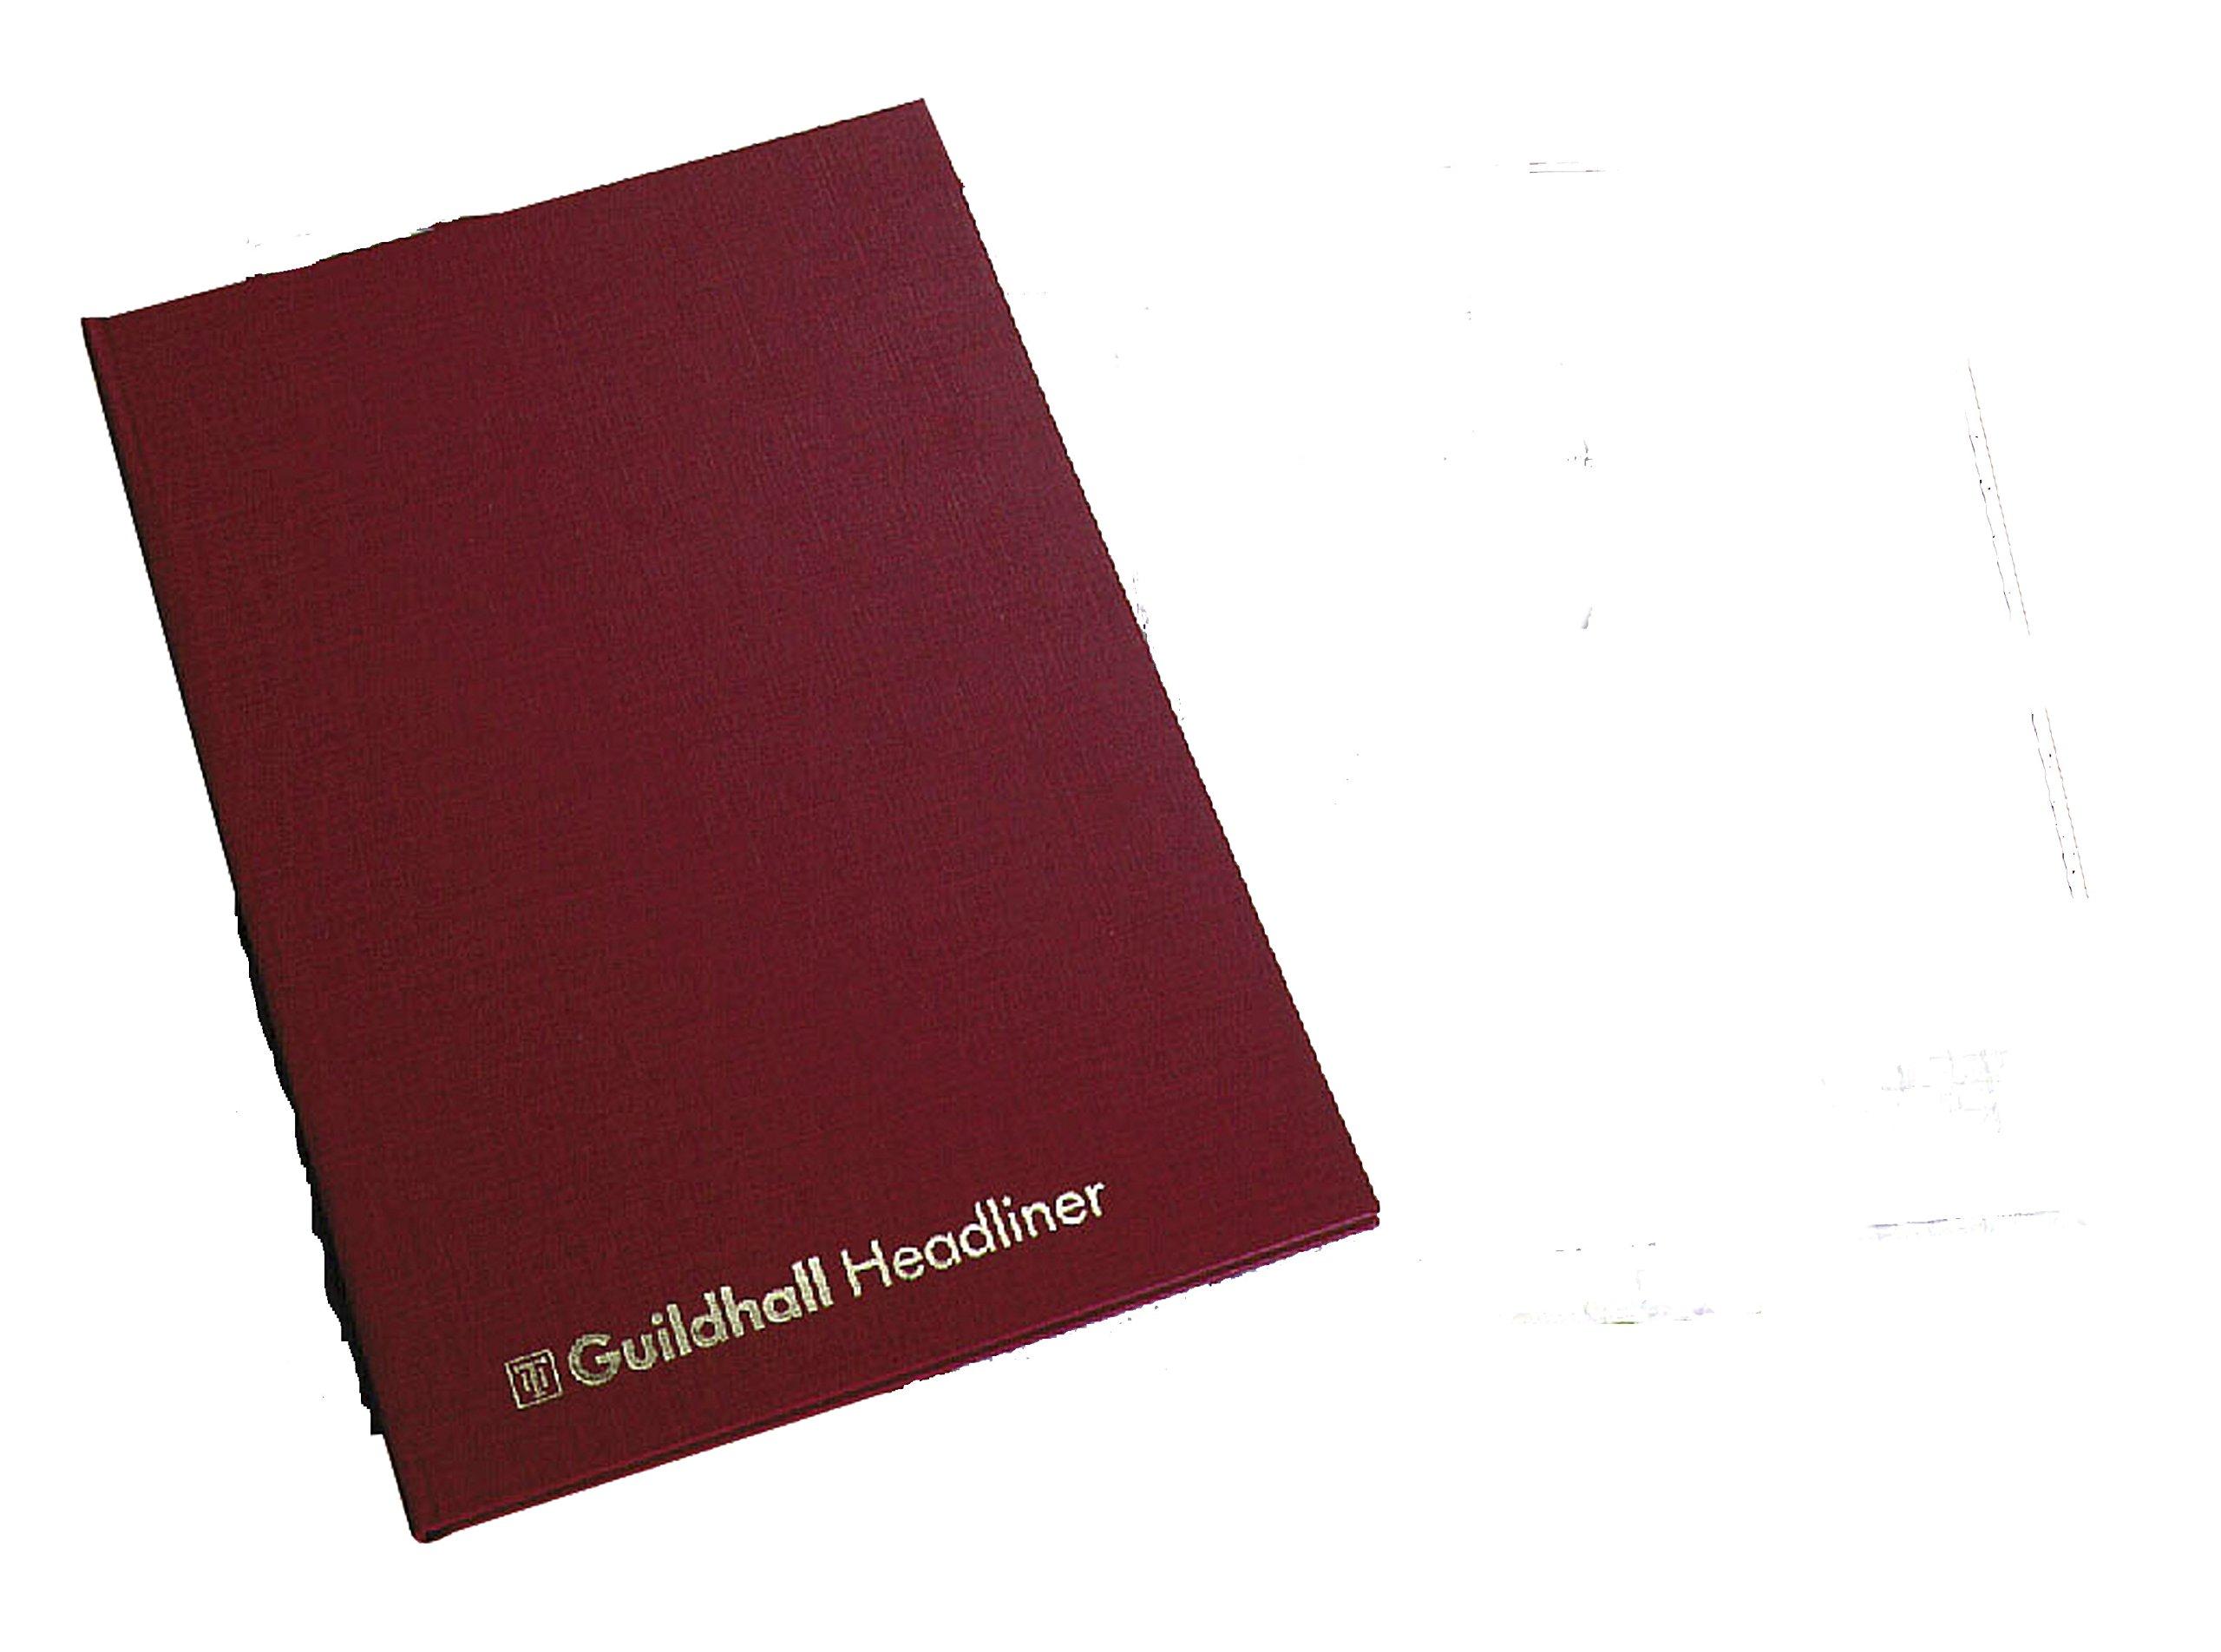 GUILDHALL HEADLINER BOOK 298X203 38/6